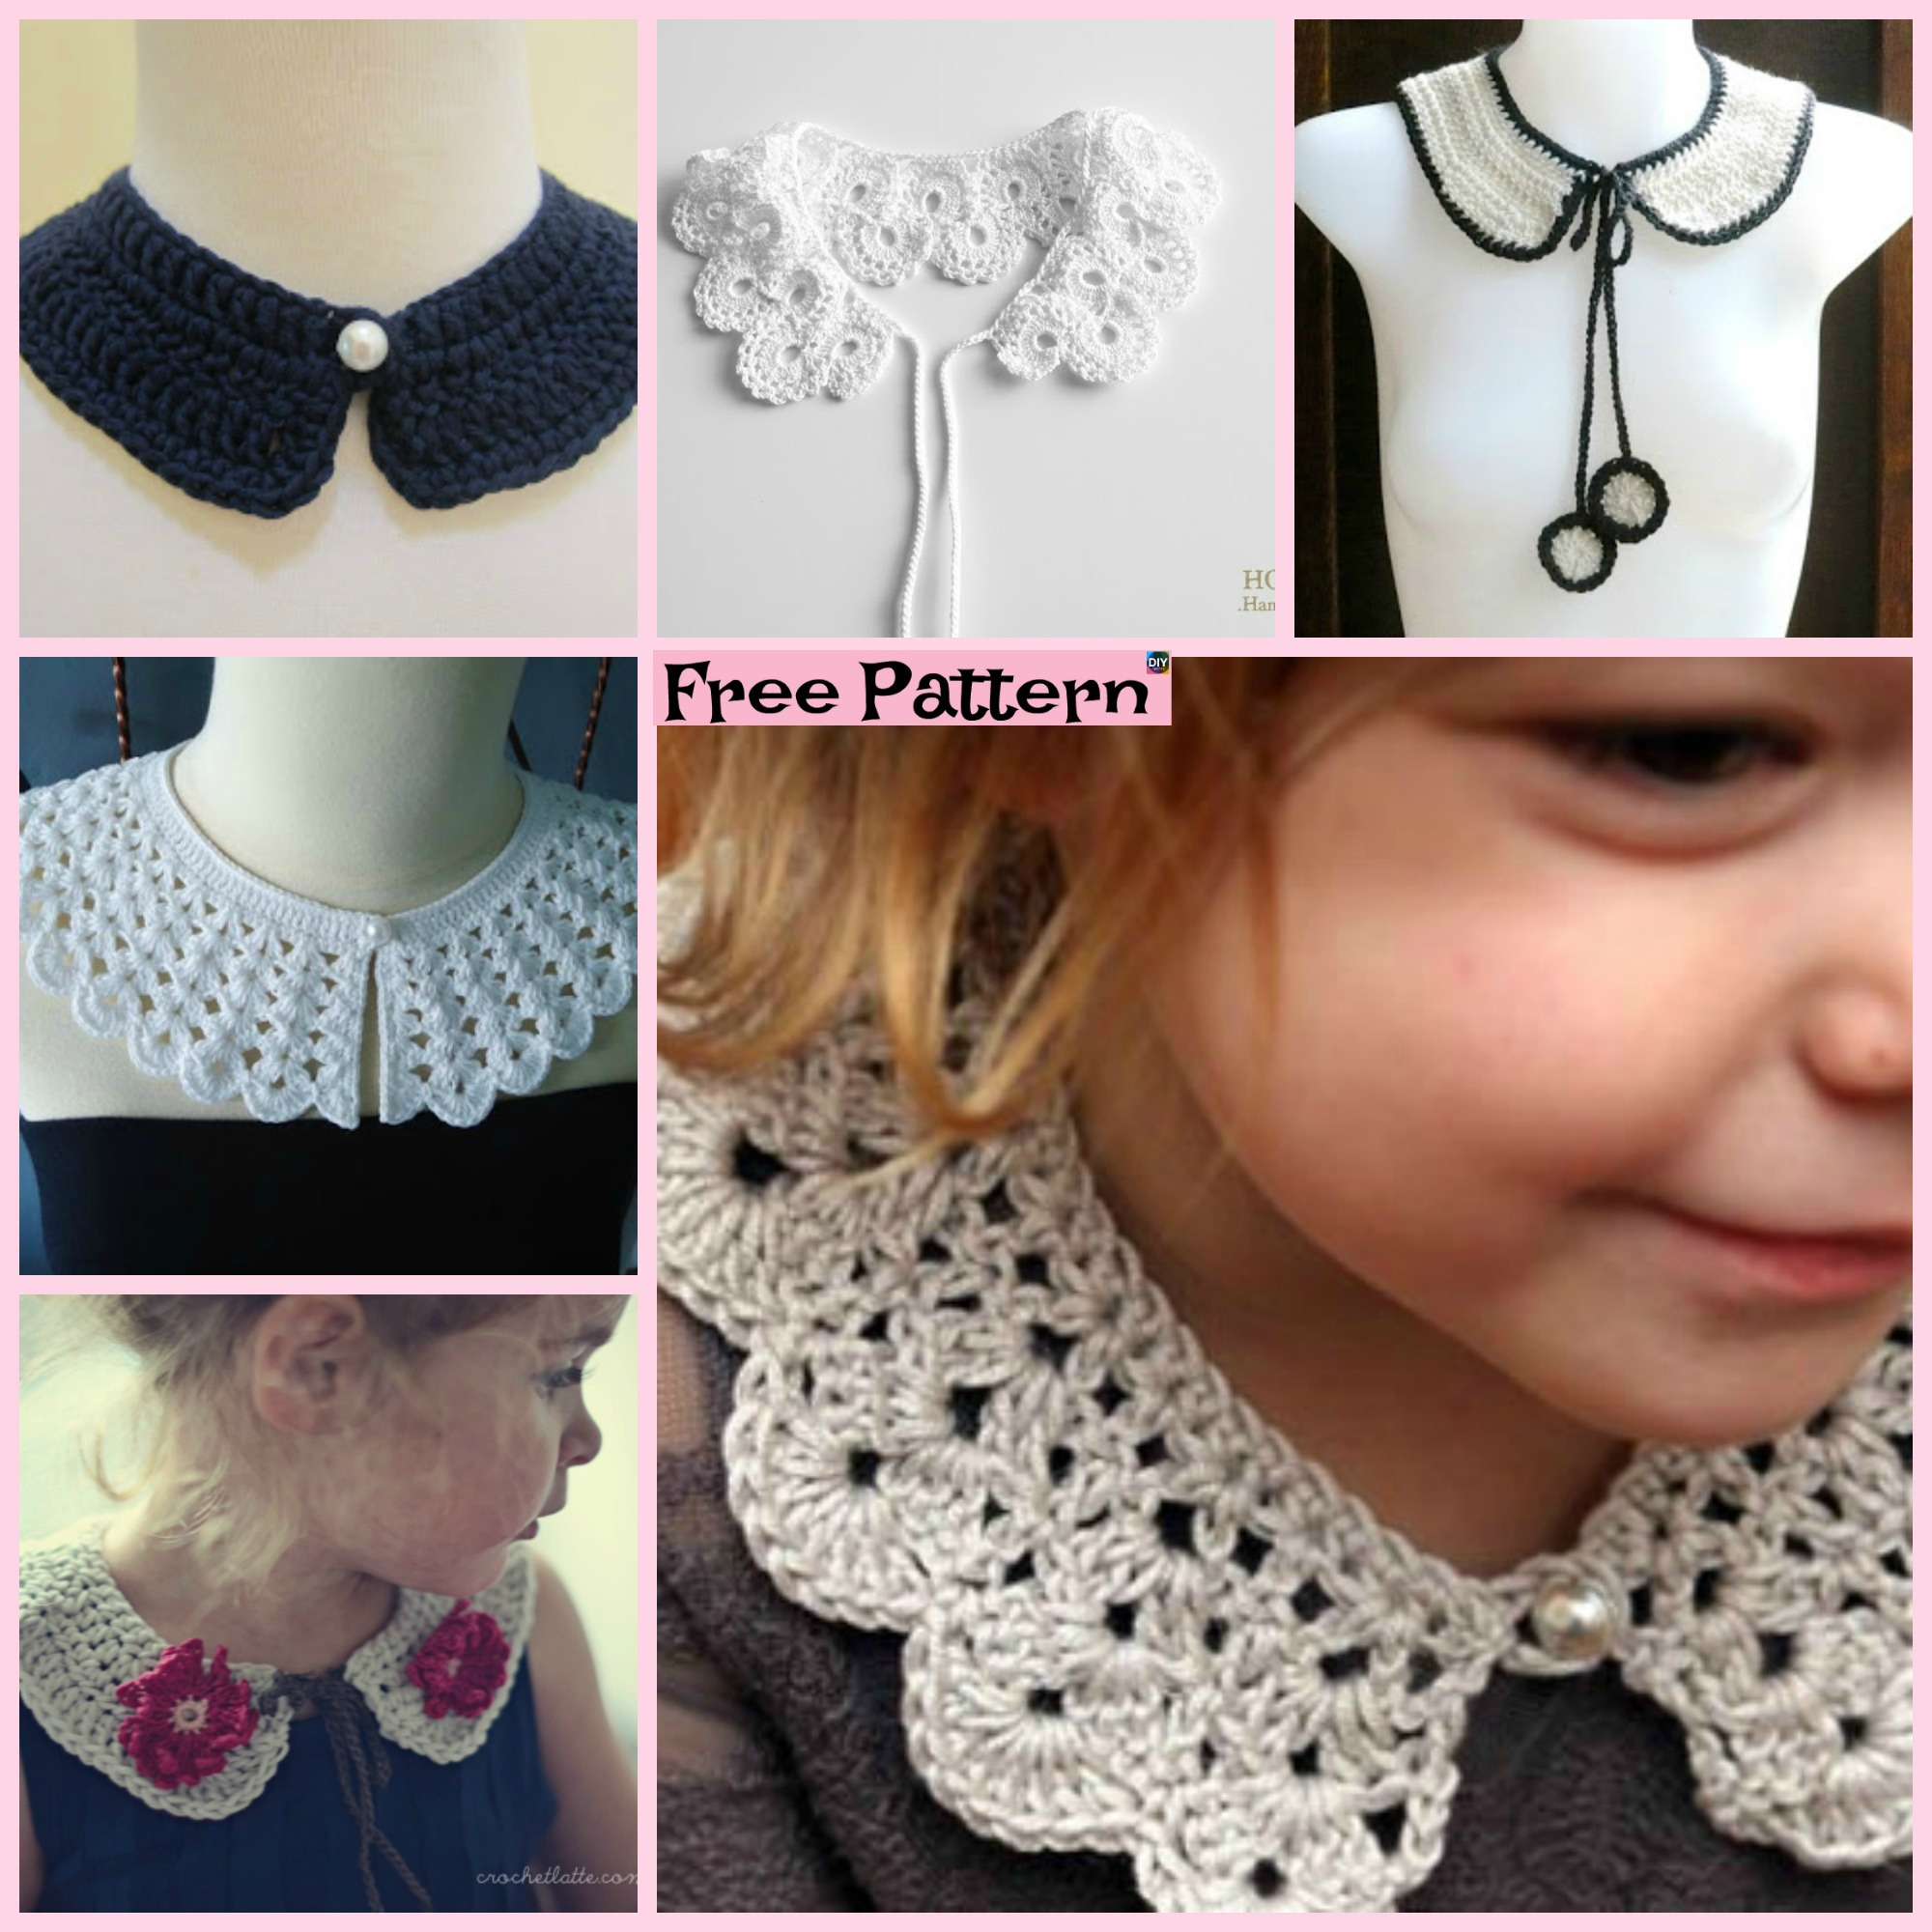 diy4ever-12 Pretty Crochet Simple Collar Free Patterns